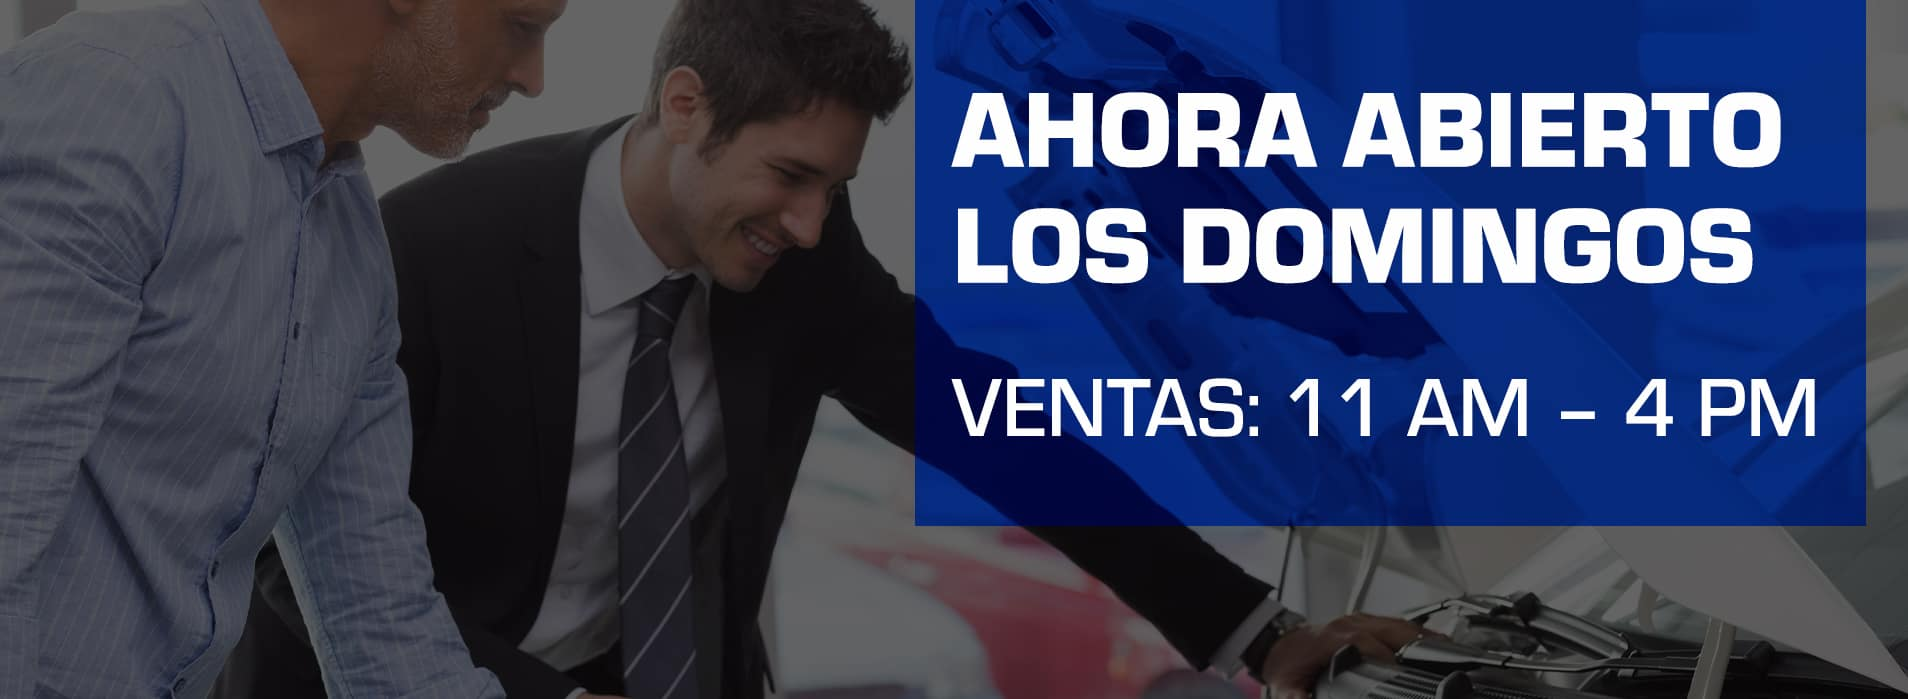 124-0621-SCO5095_Spanish